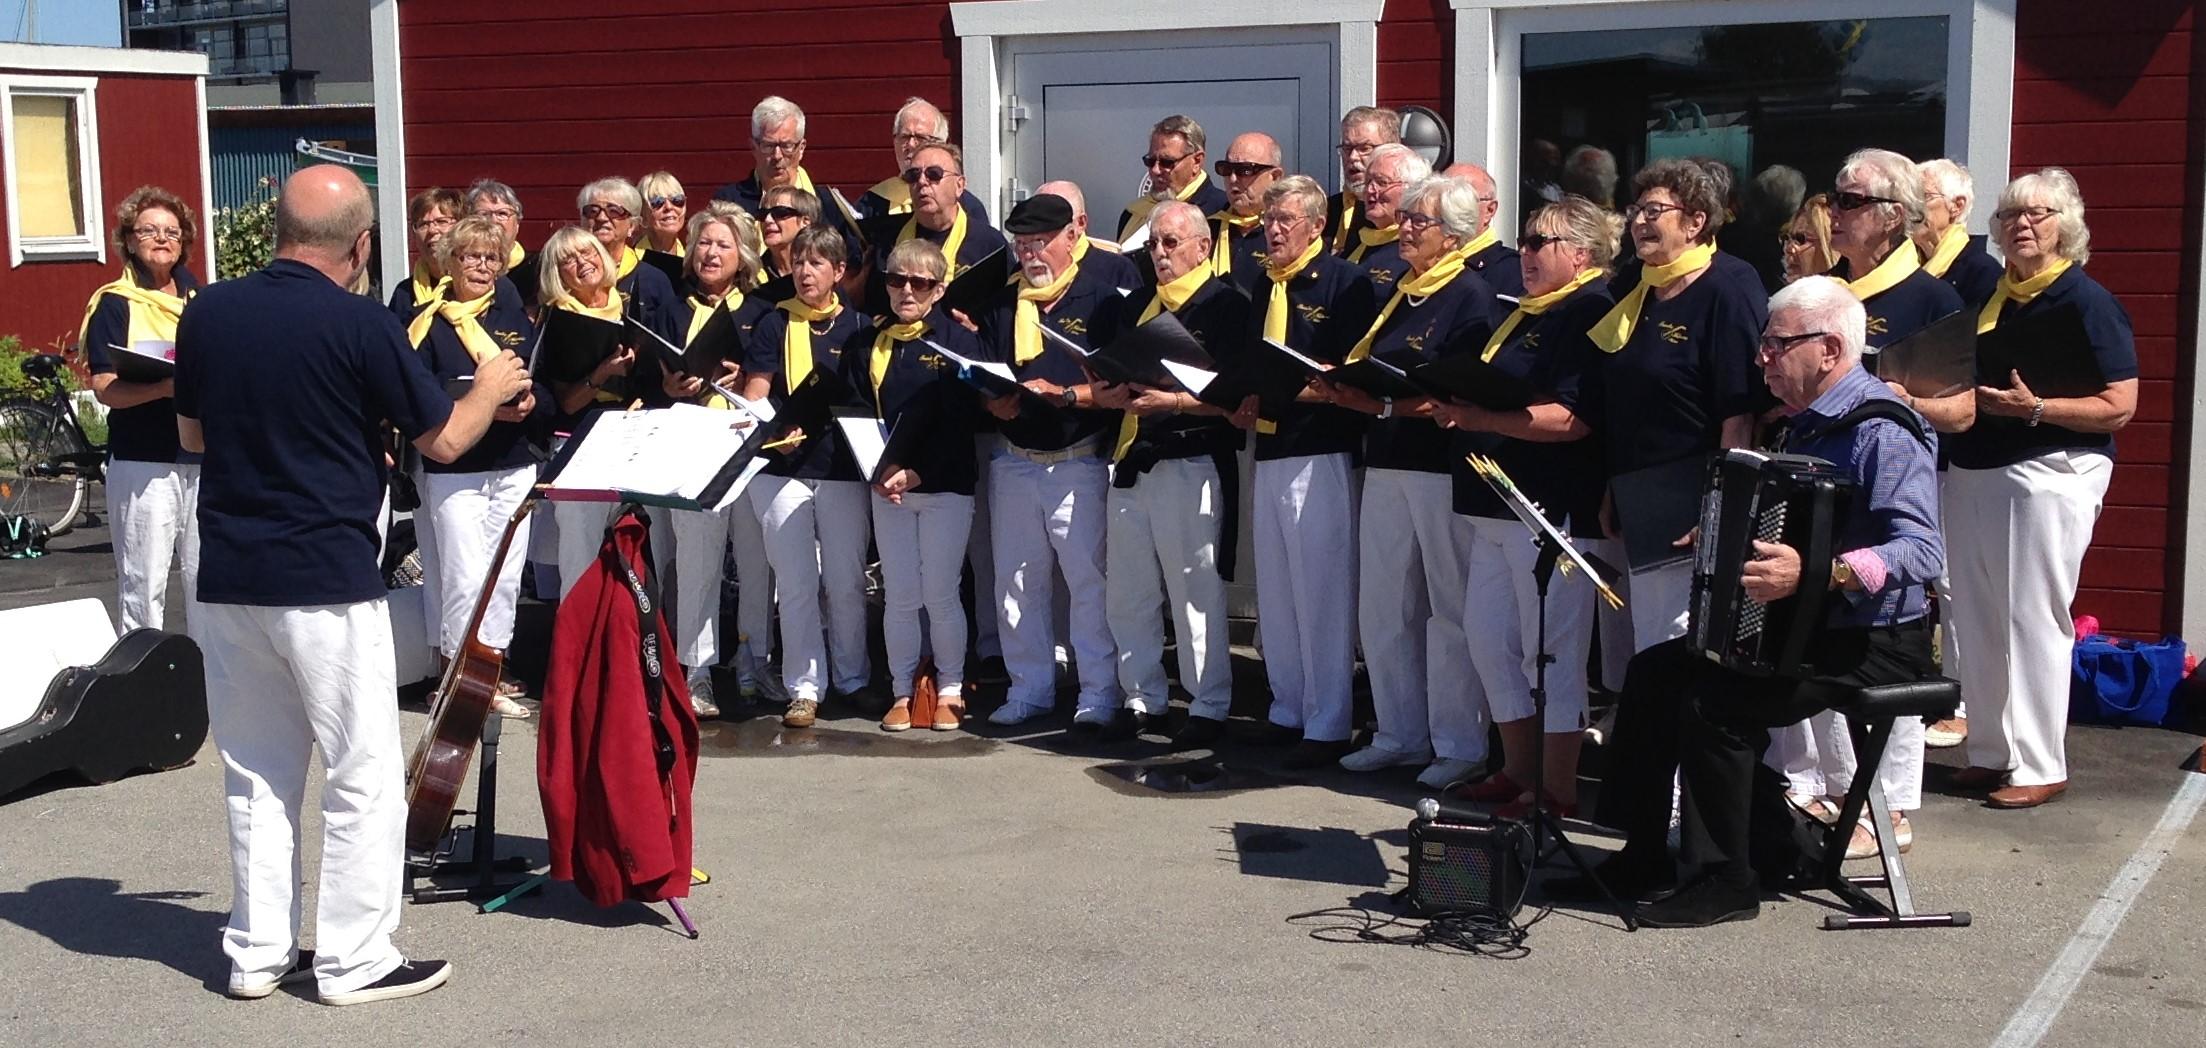 Limhamns Hamnfestival 2015